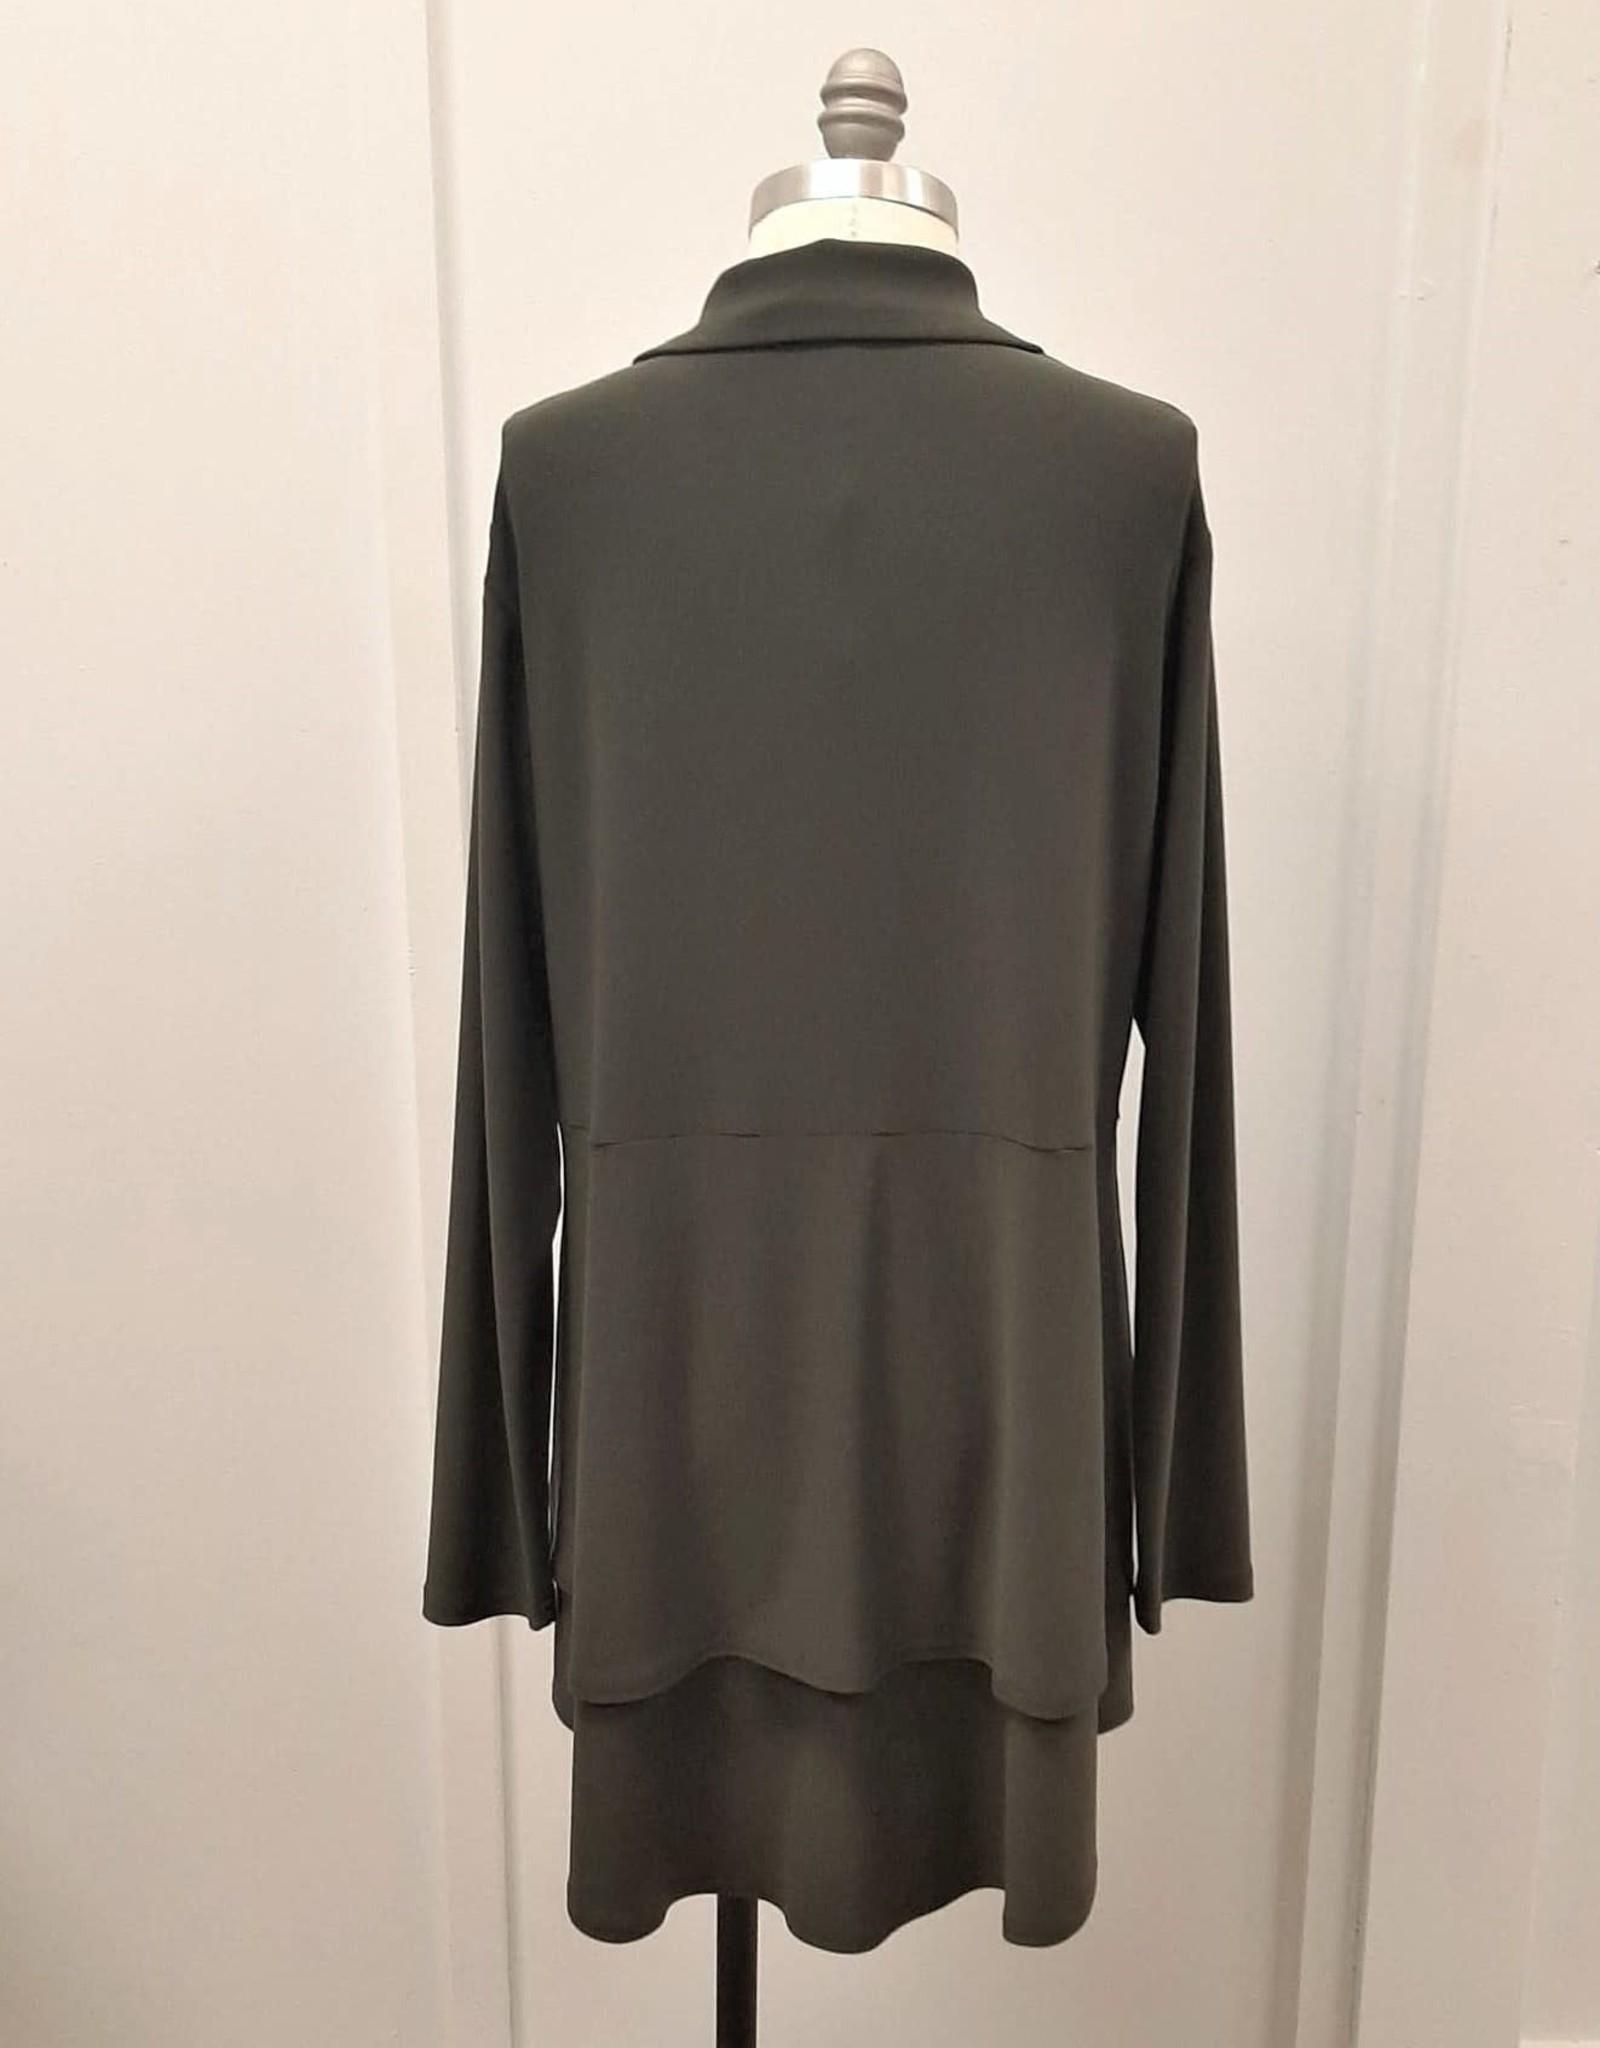 Sympli Charm Shirt - Size 12 (Consignment)